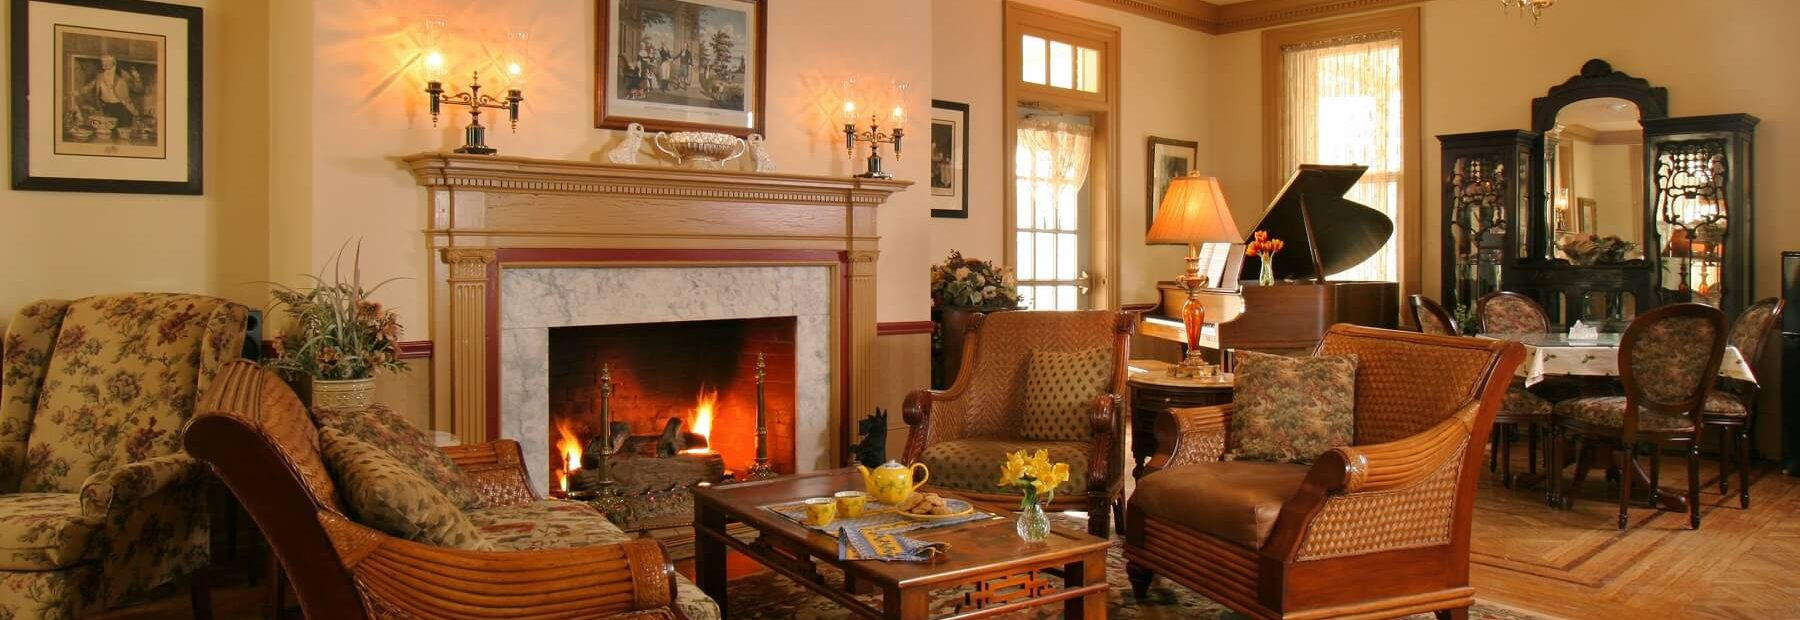 The Lafayette Inn Fireplace